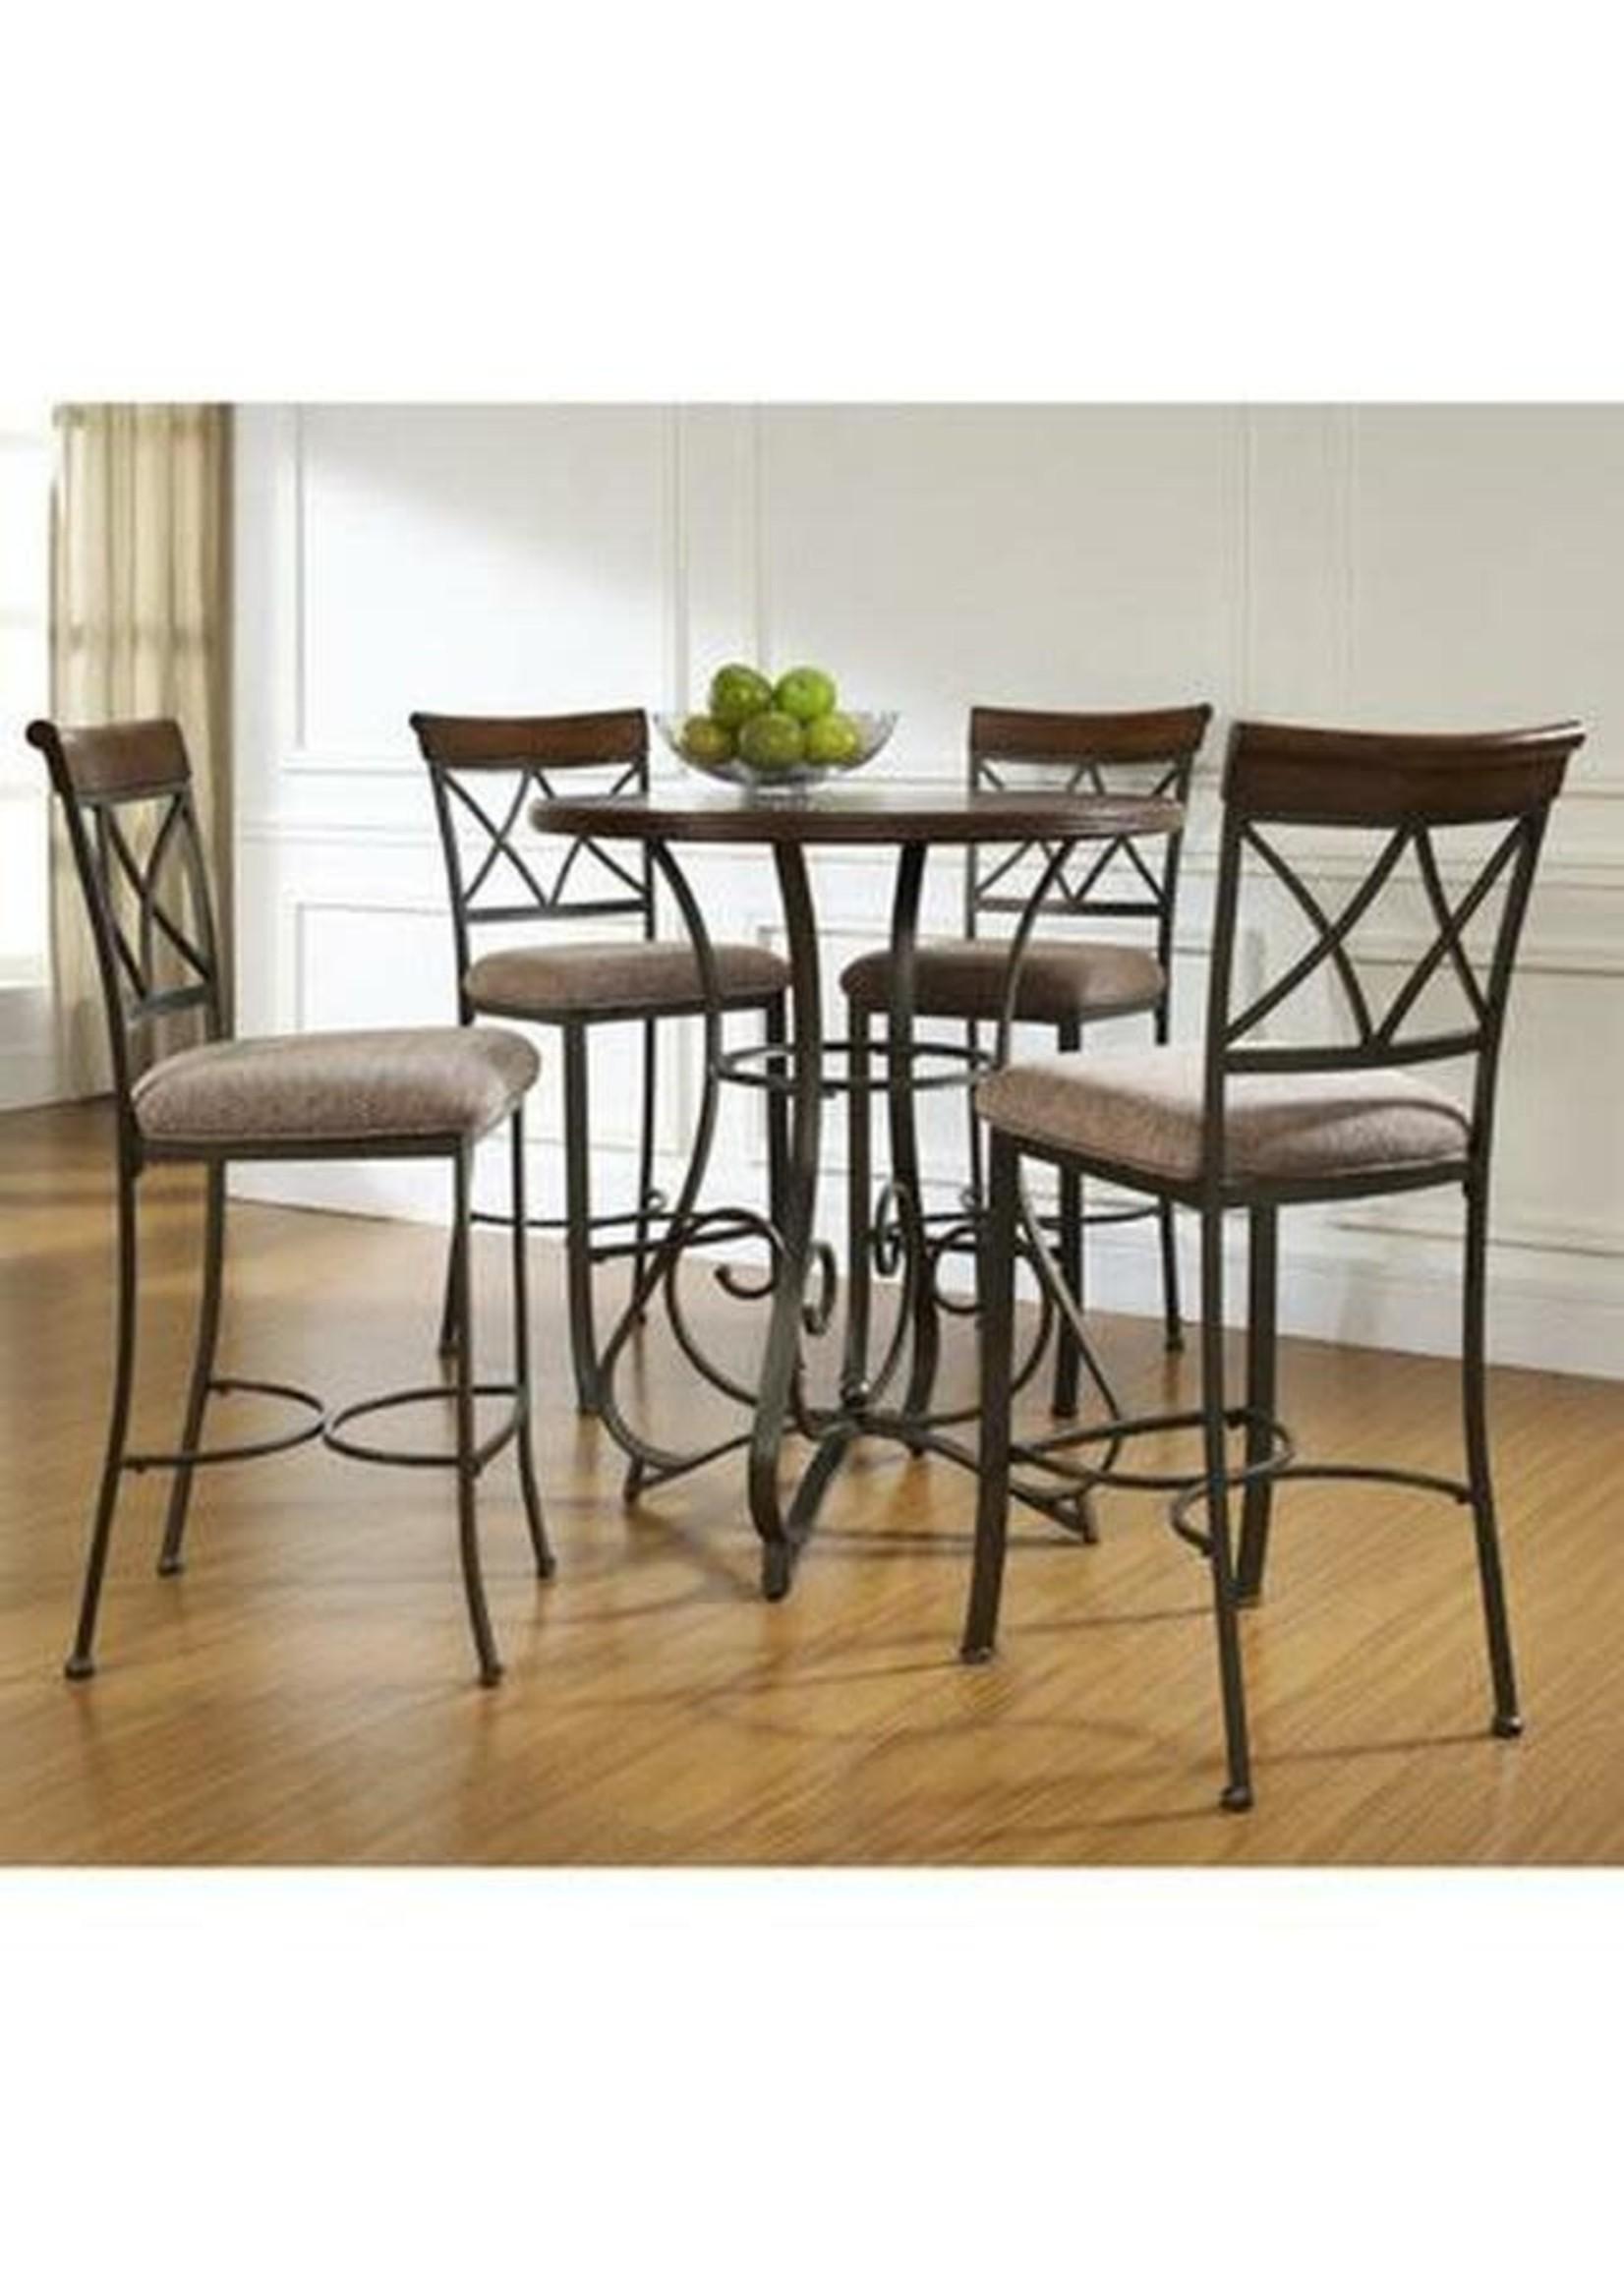 LINON 697-404M3 5PC HAMILTON PUB TABLE SET